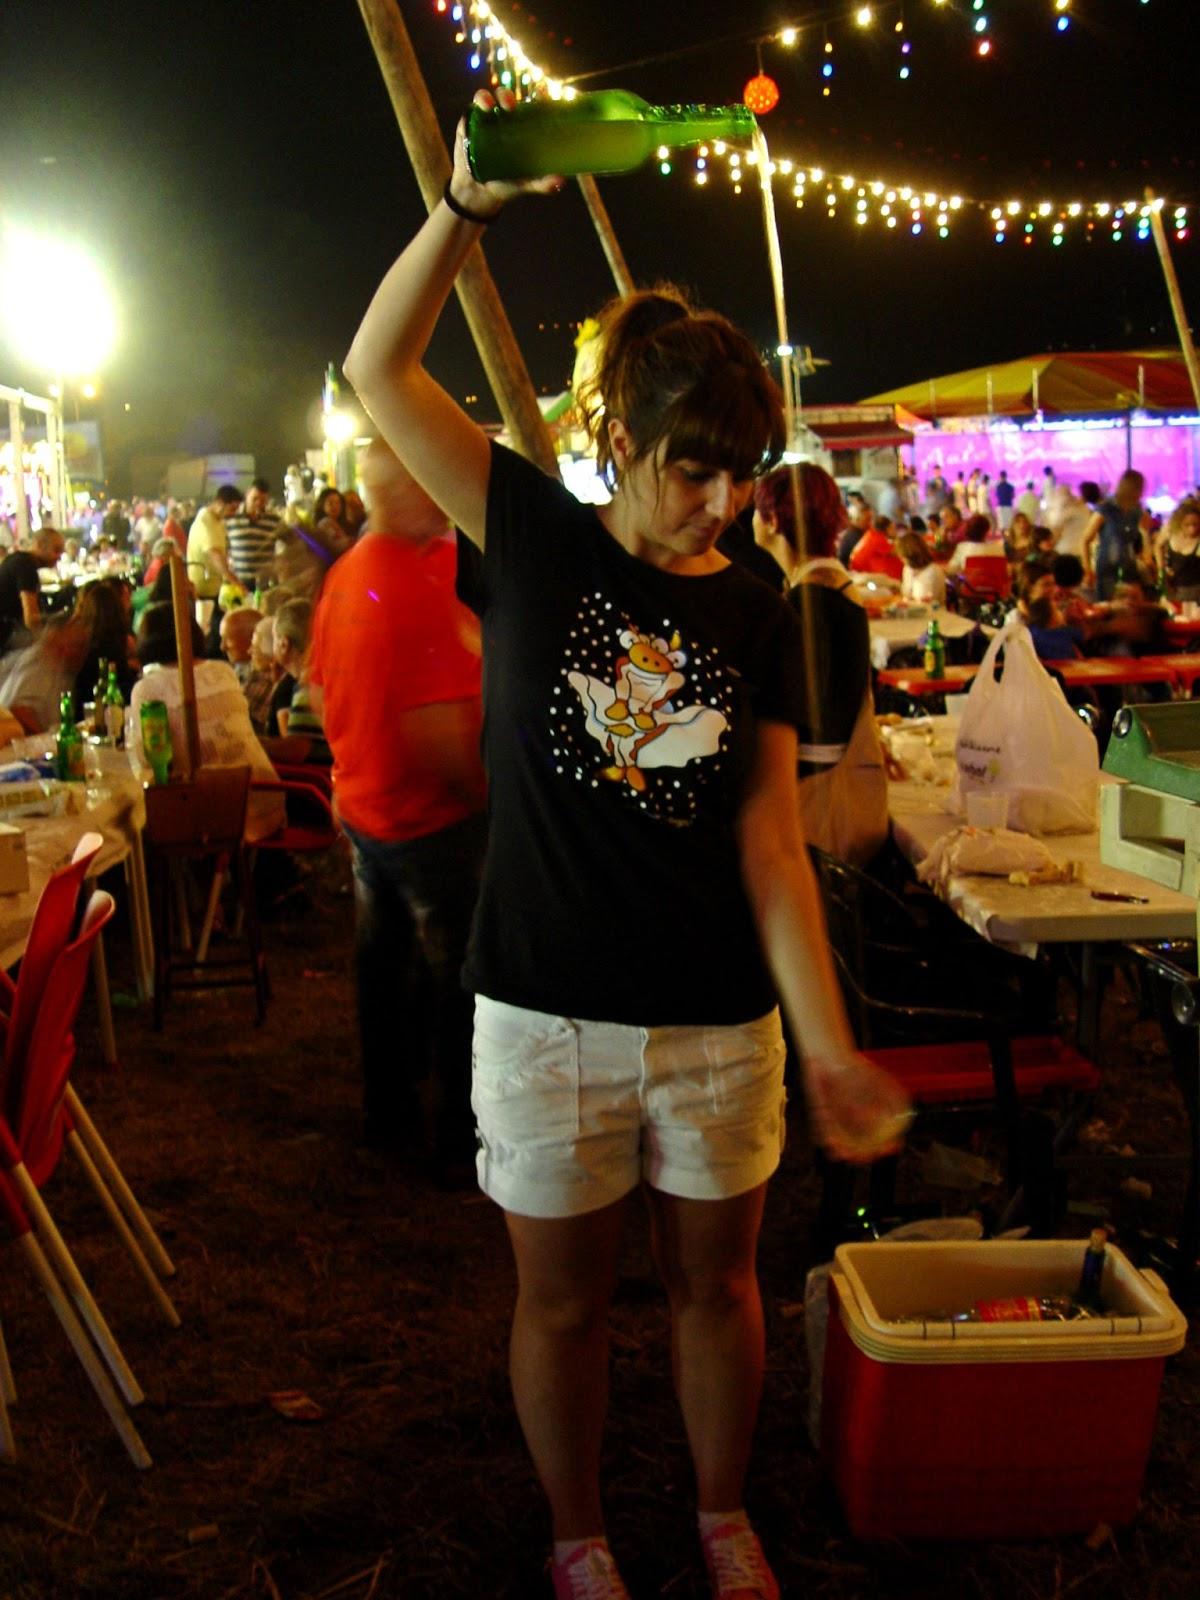 fiestas pueblo prao asturias berron sidra